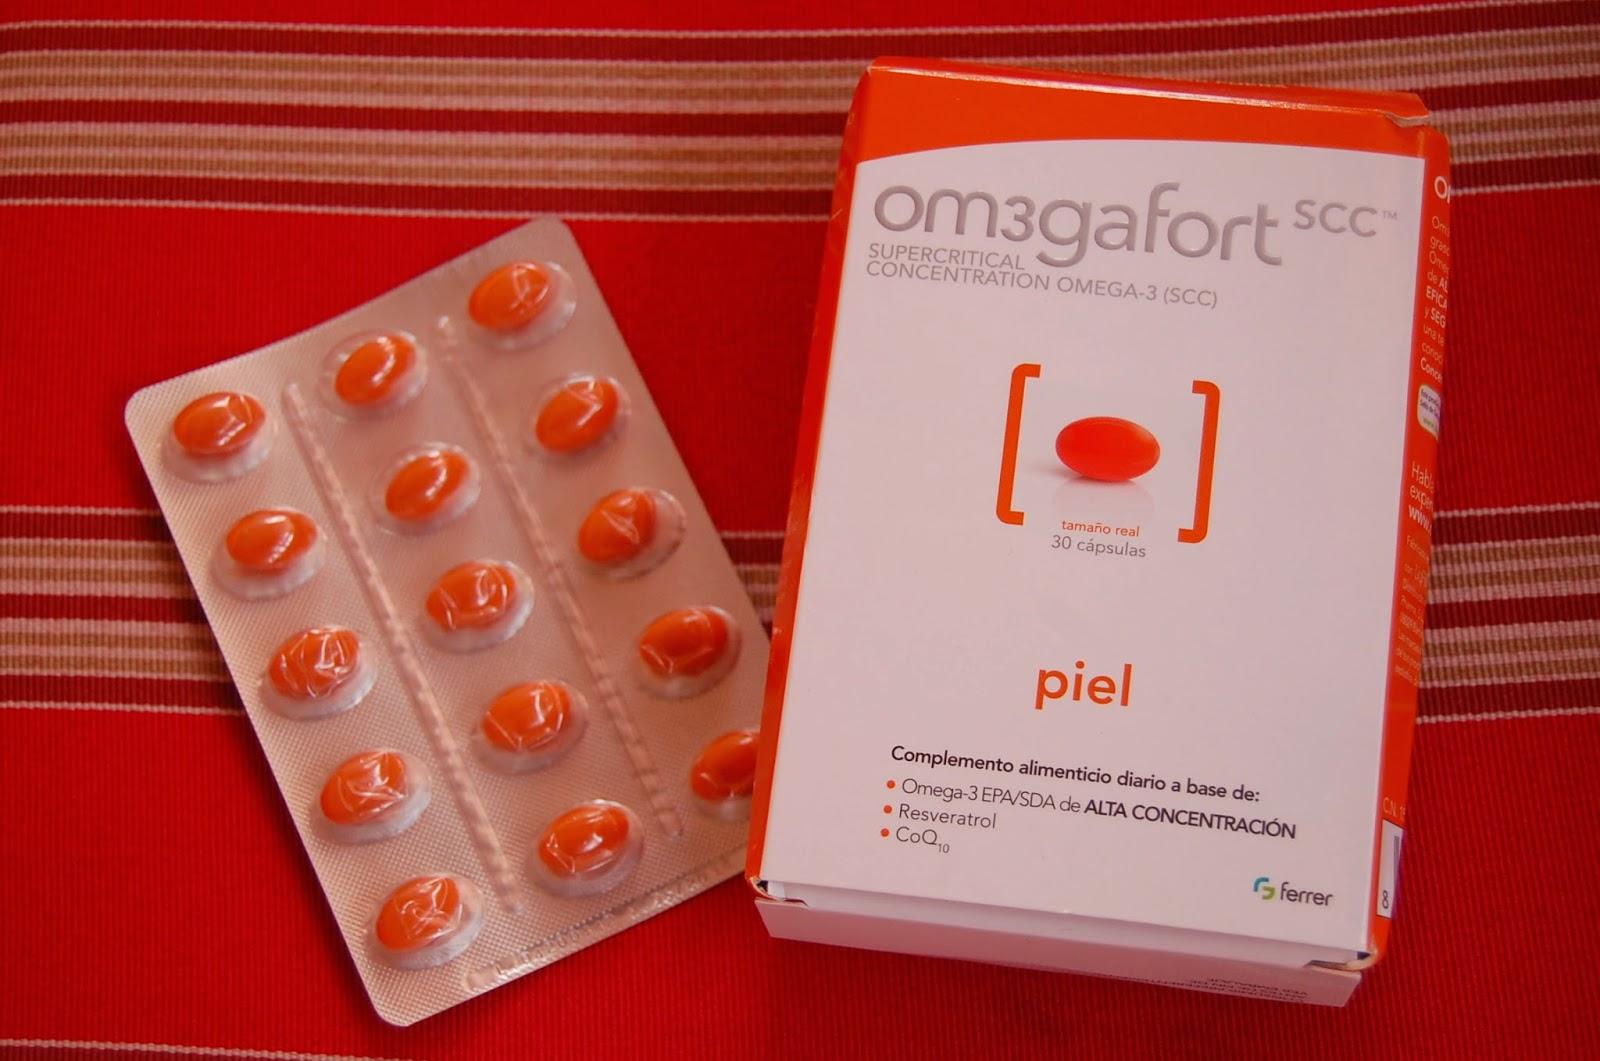 Capsulas Om3gafort scc Piel de Omegafort